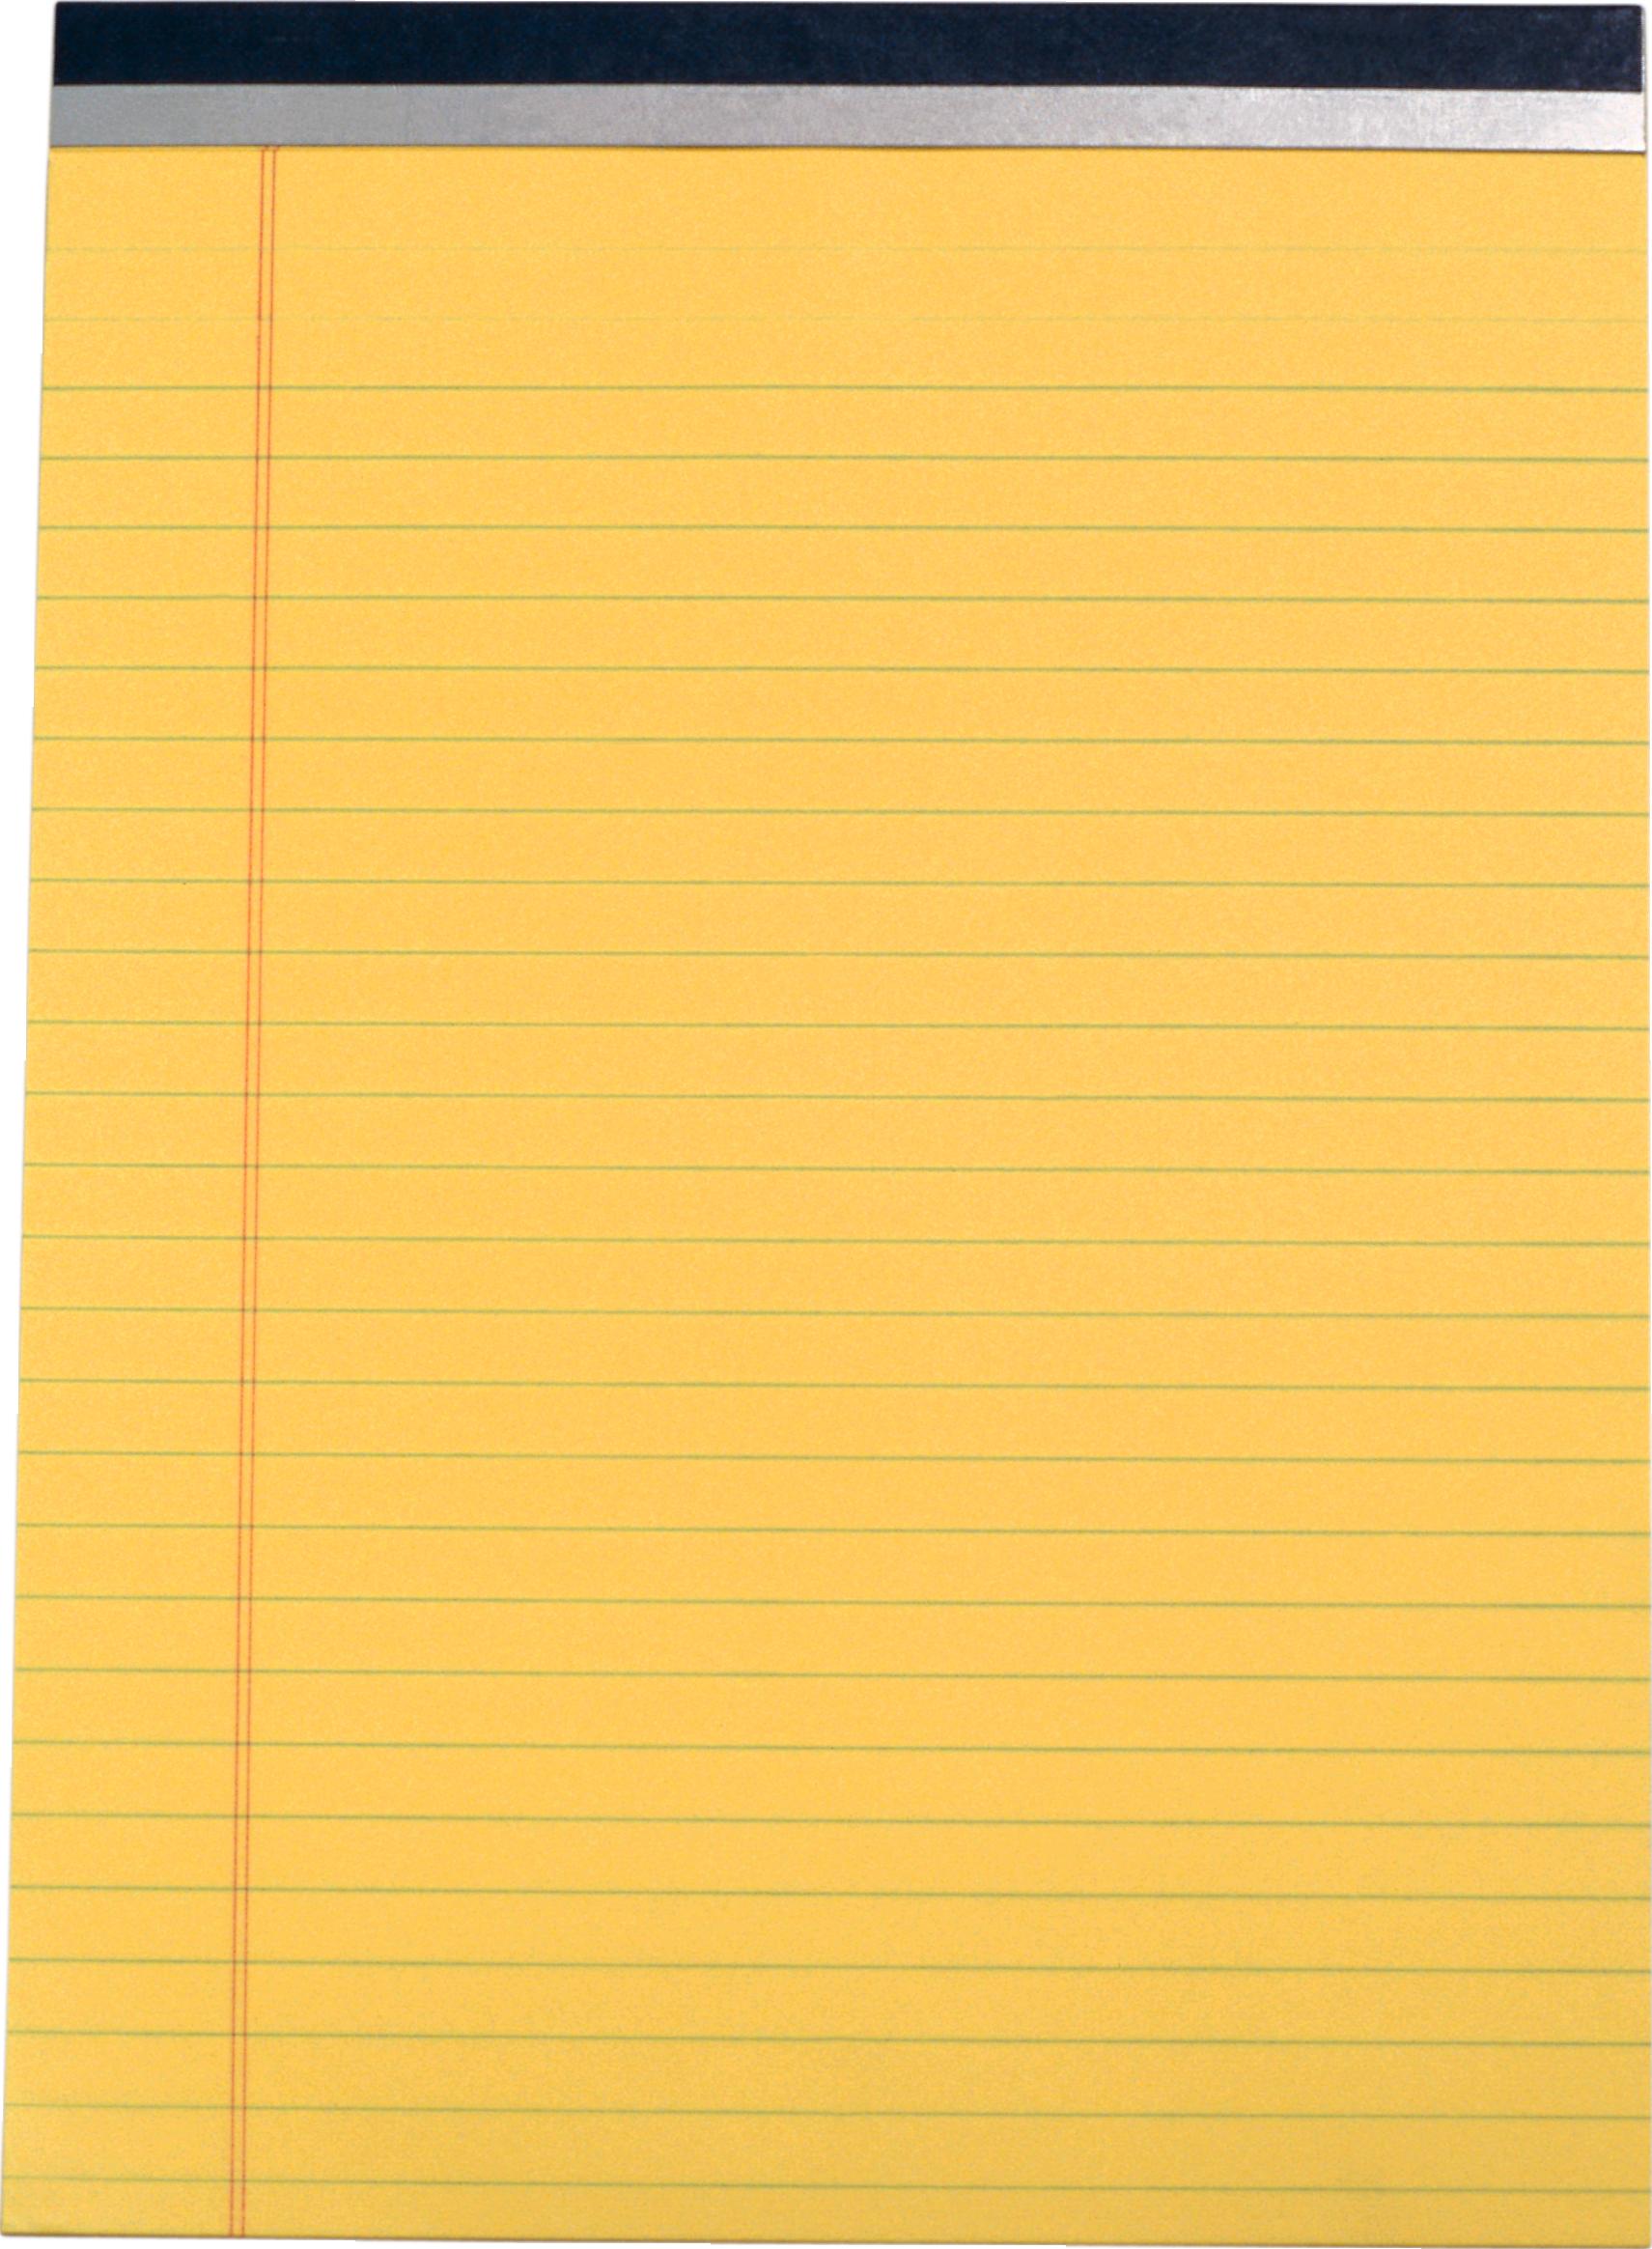 Paper sheet PNG image